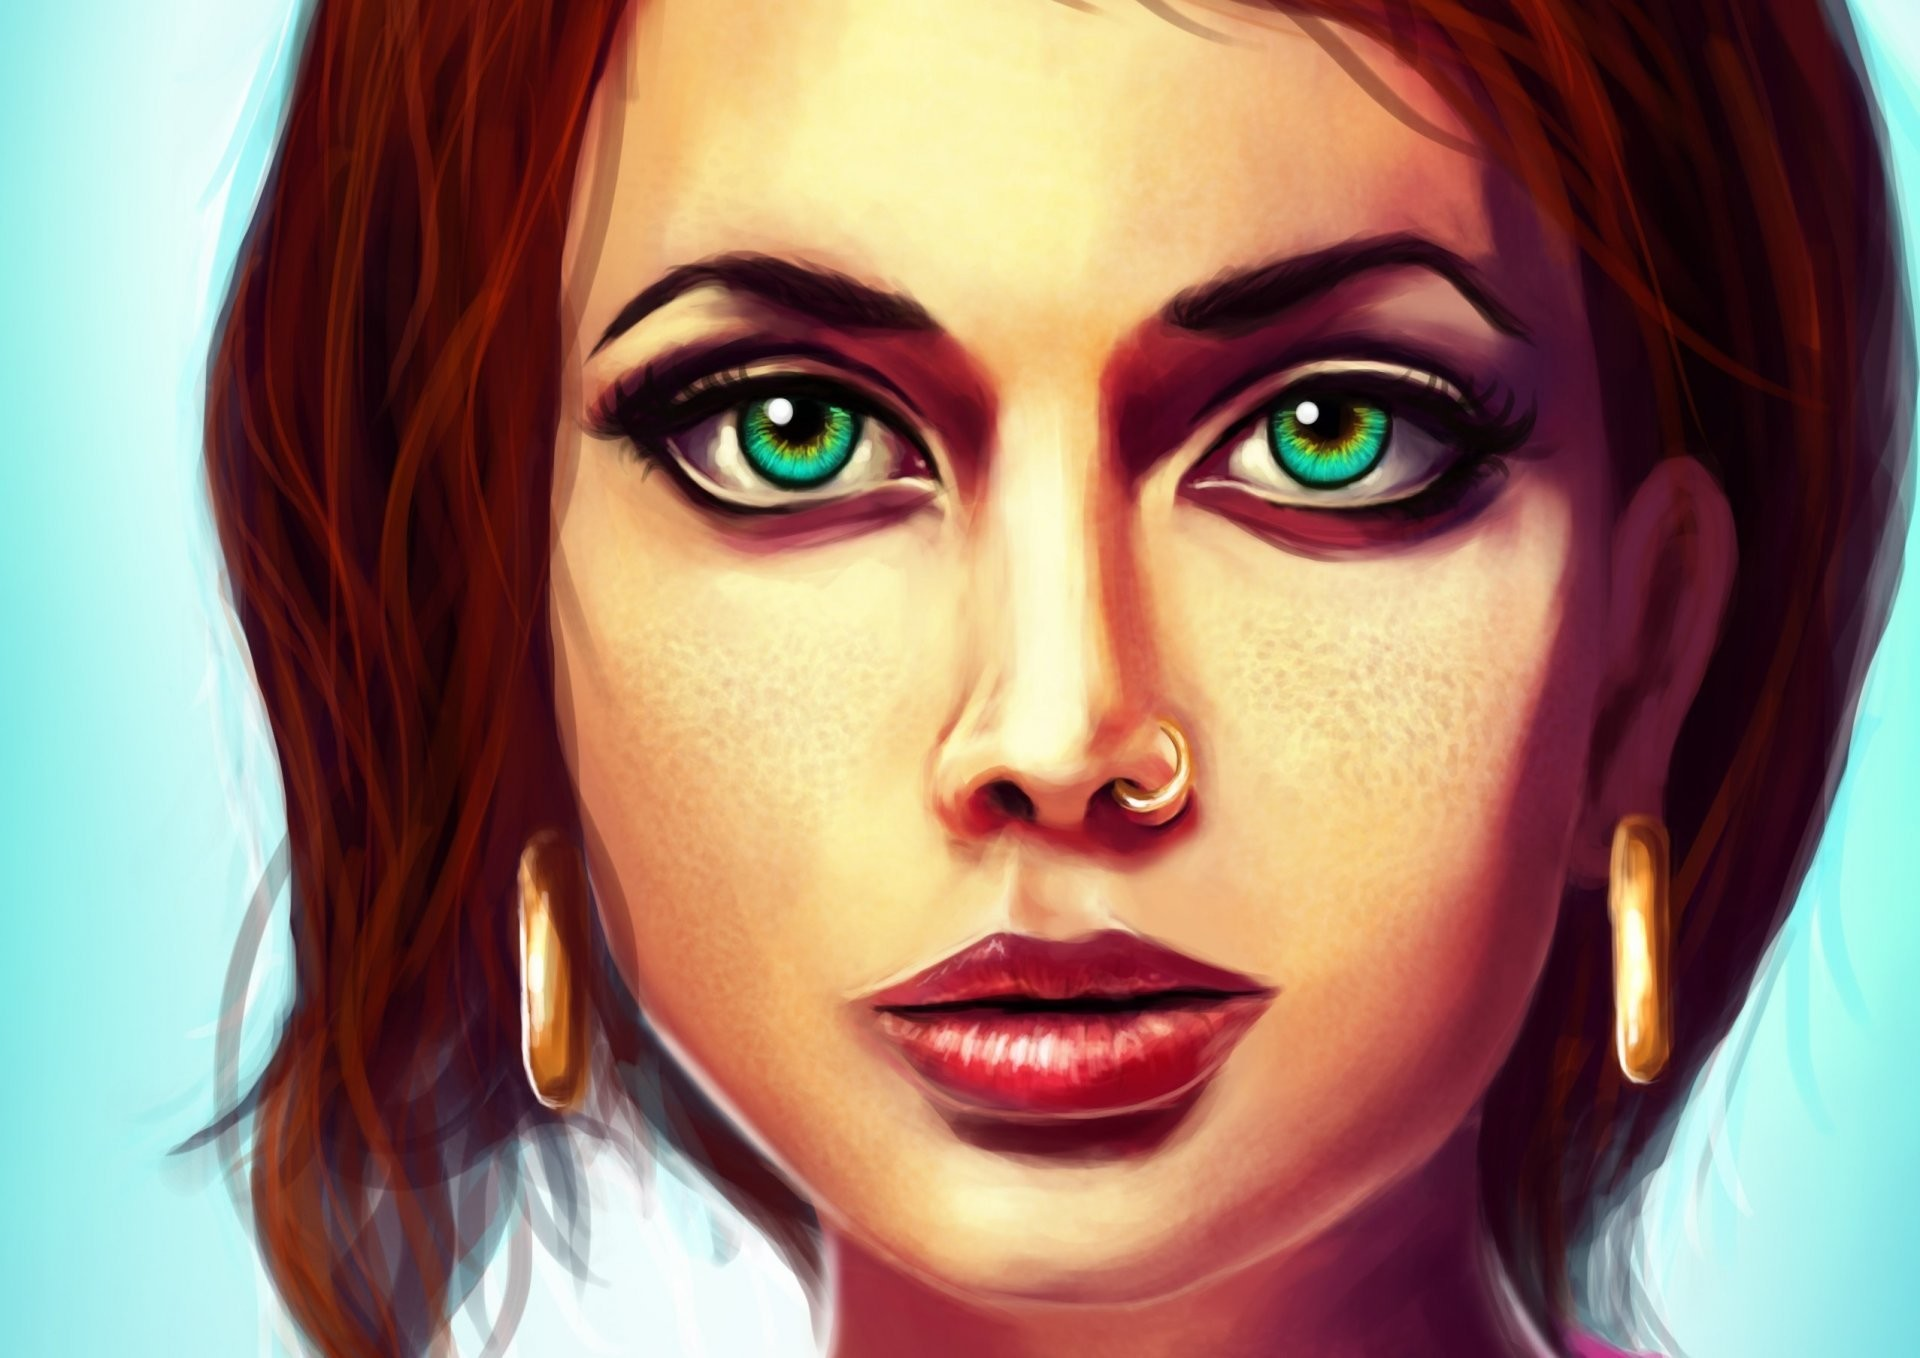 robert jordan robert jordan wheel of time the wheel of time. girl face  green eyes